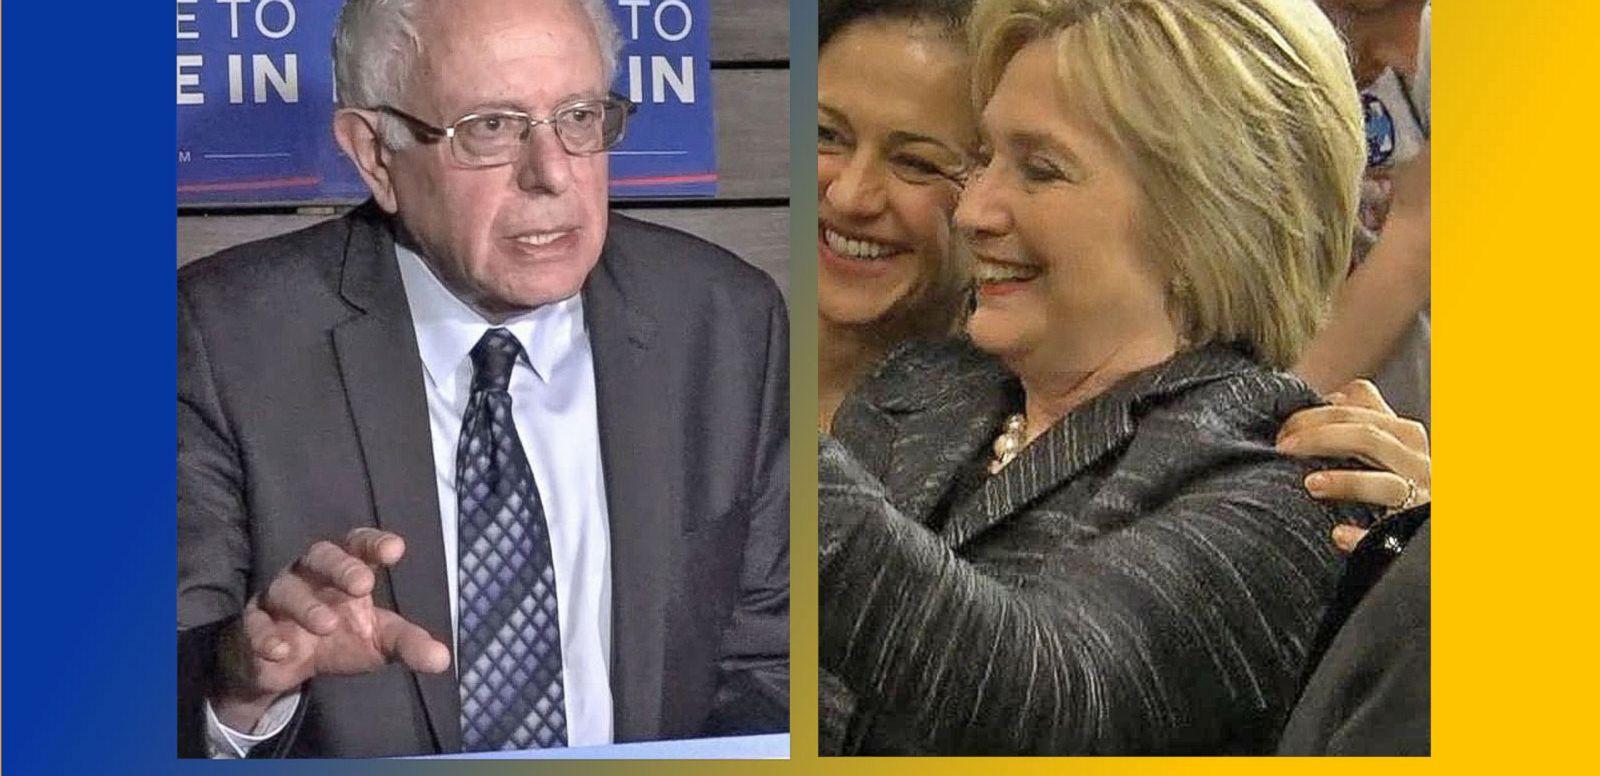 VIDEO: Bernie Sanders Beats Hillary Clinton in Michigan